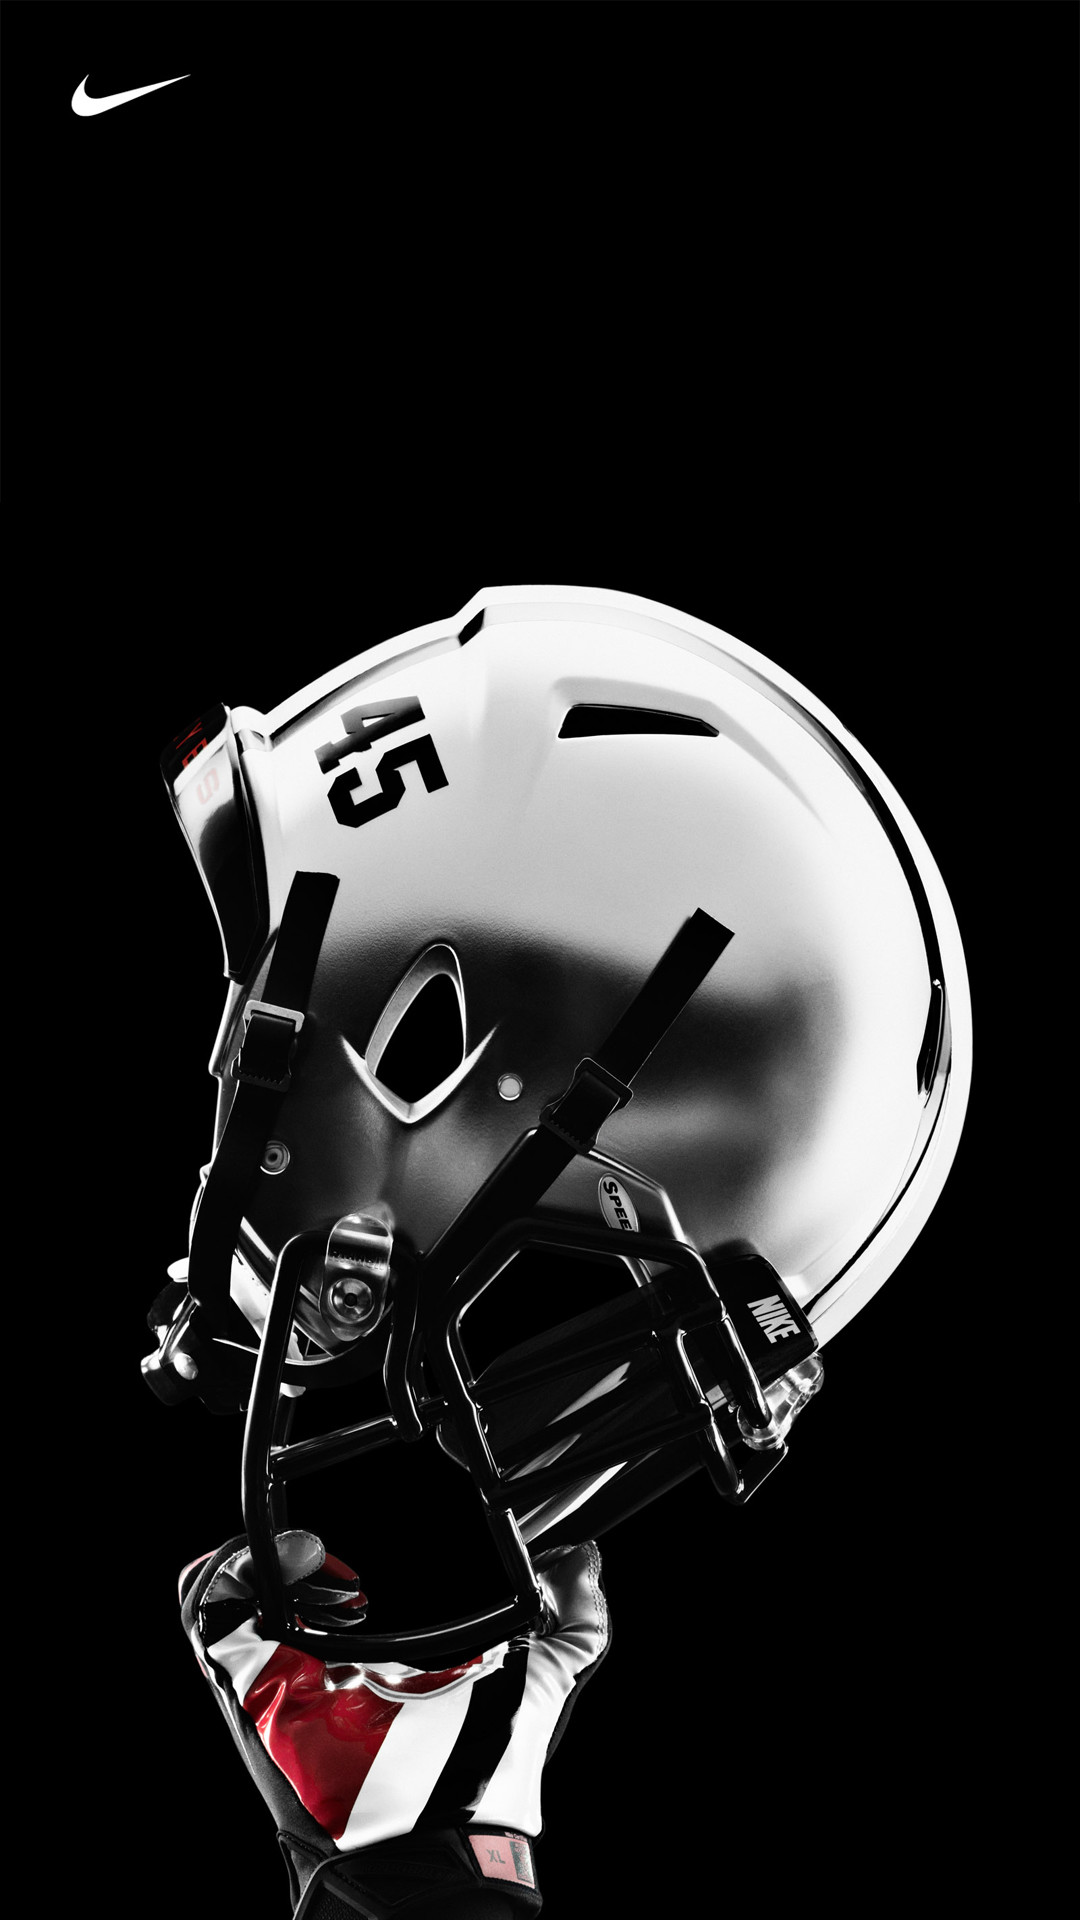 Ohio-State-Nike-Pro-Combat-Football-Uniform-Helmet2.jpg (1080×1920) |  wallpapers | Pinterest | Nike pro combat, Hd wallpaper and Wallpaper